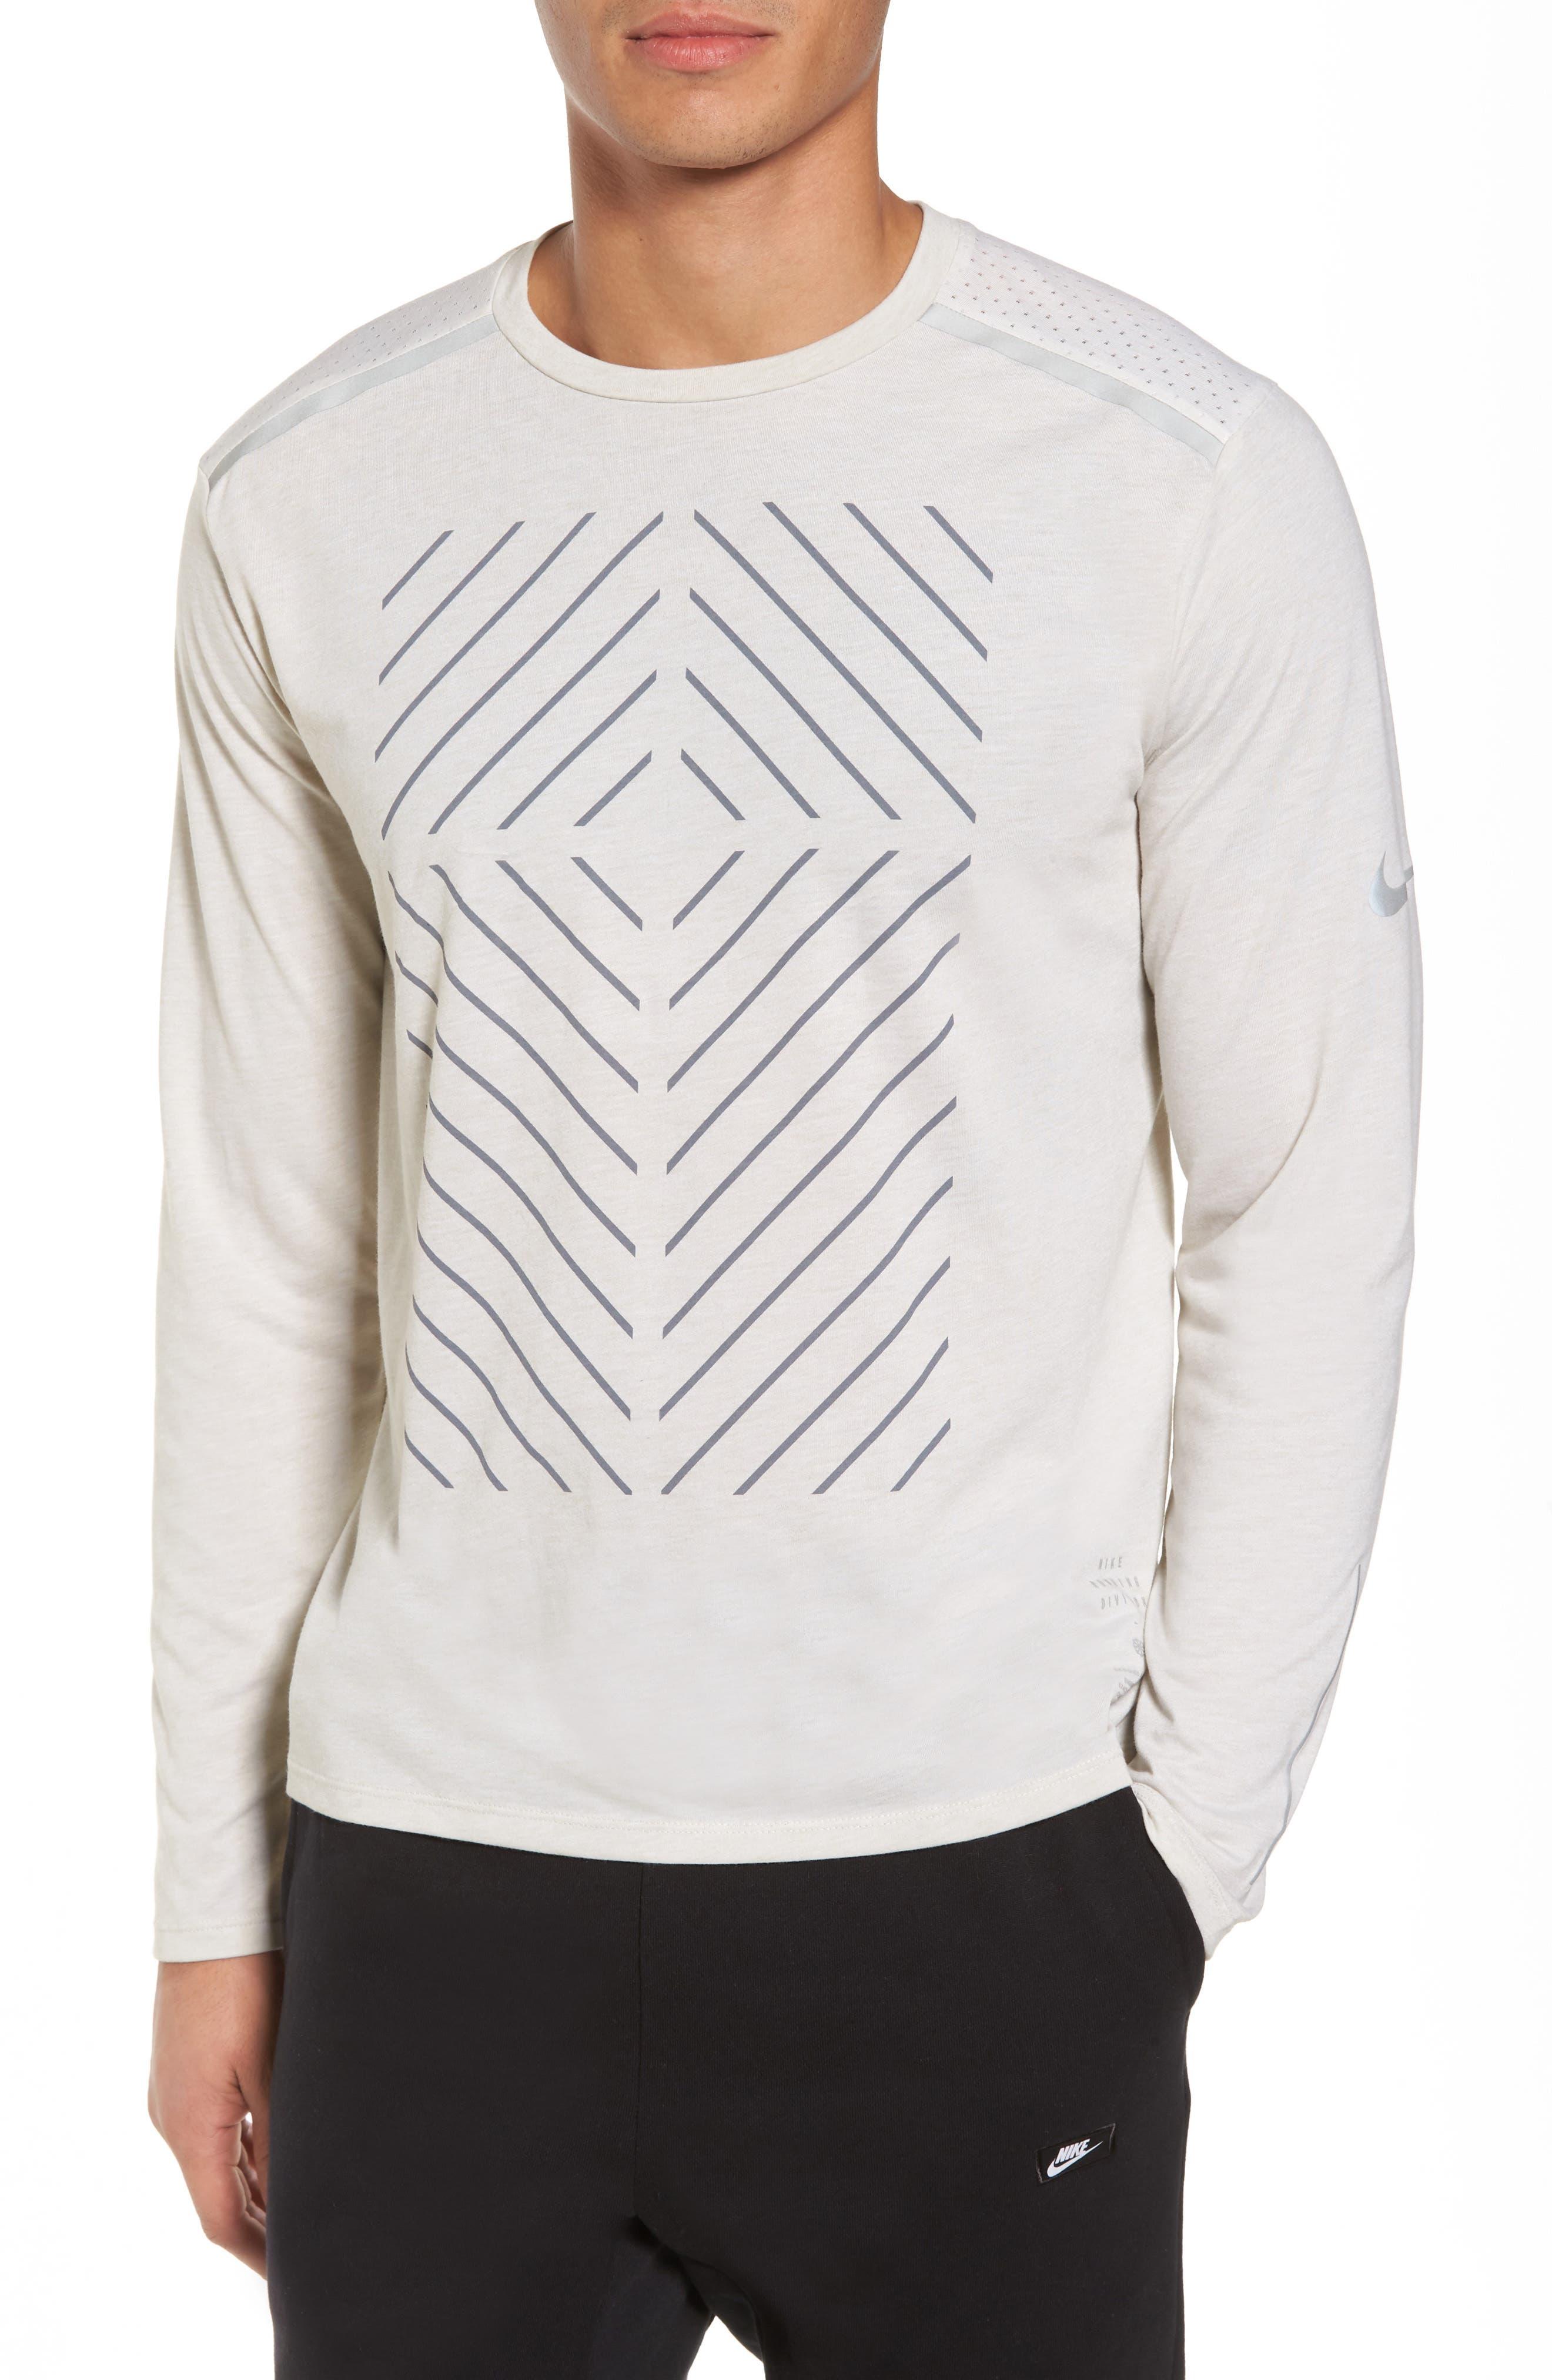 Tailwind Long Sleeve Running T-Shirt,                             Main thumbnail 1, color,                             Light Bone/ Heather